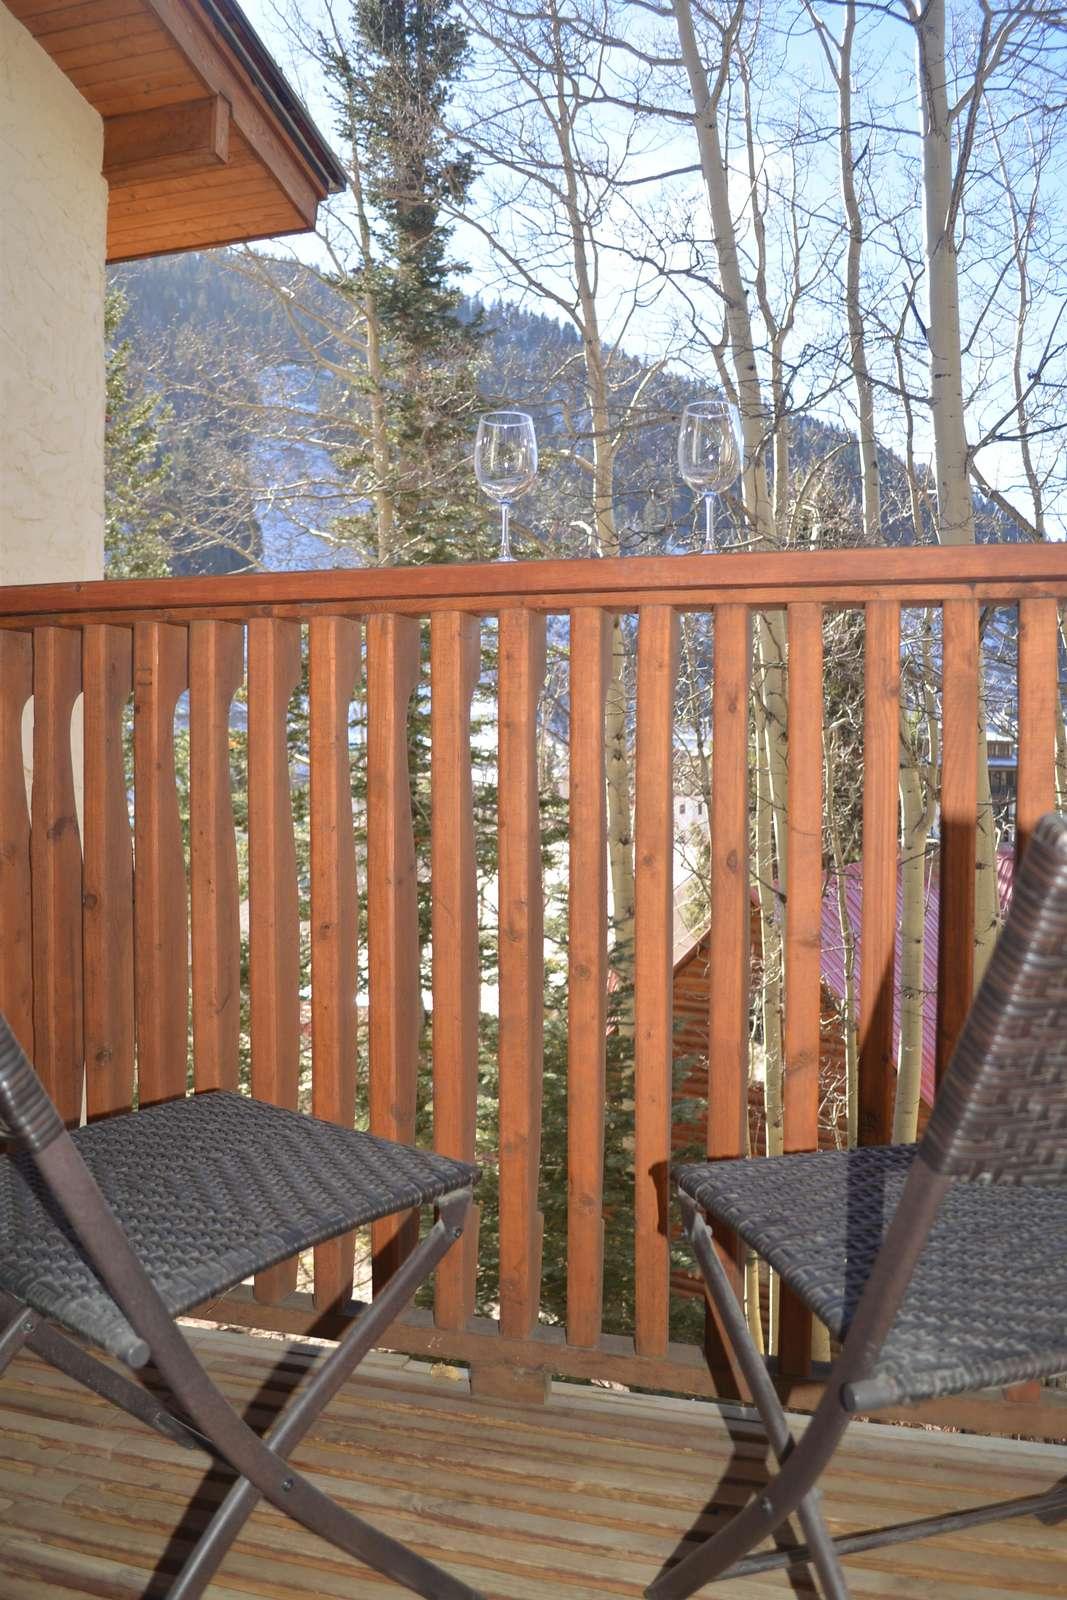 Apres Ski on the private balcony